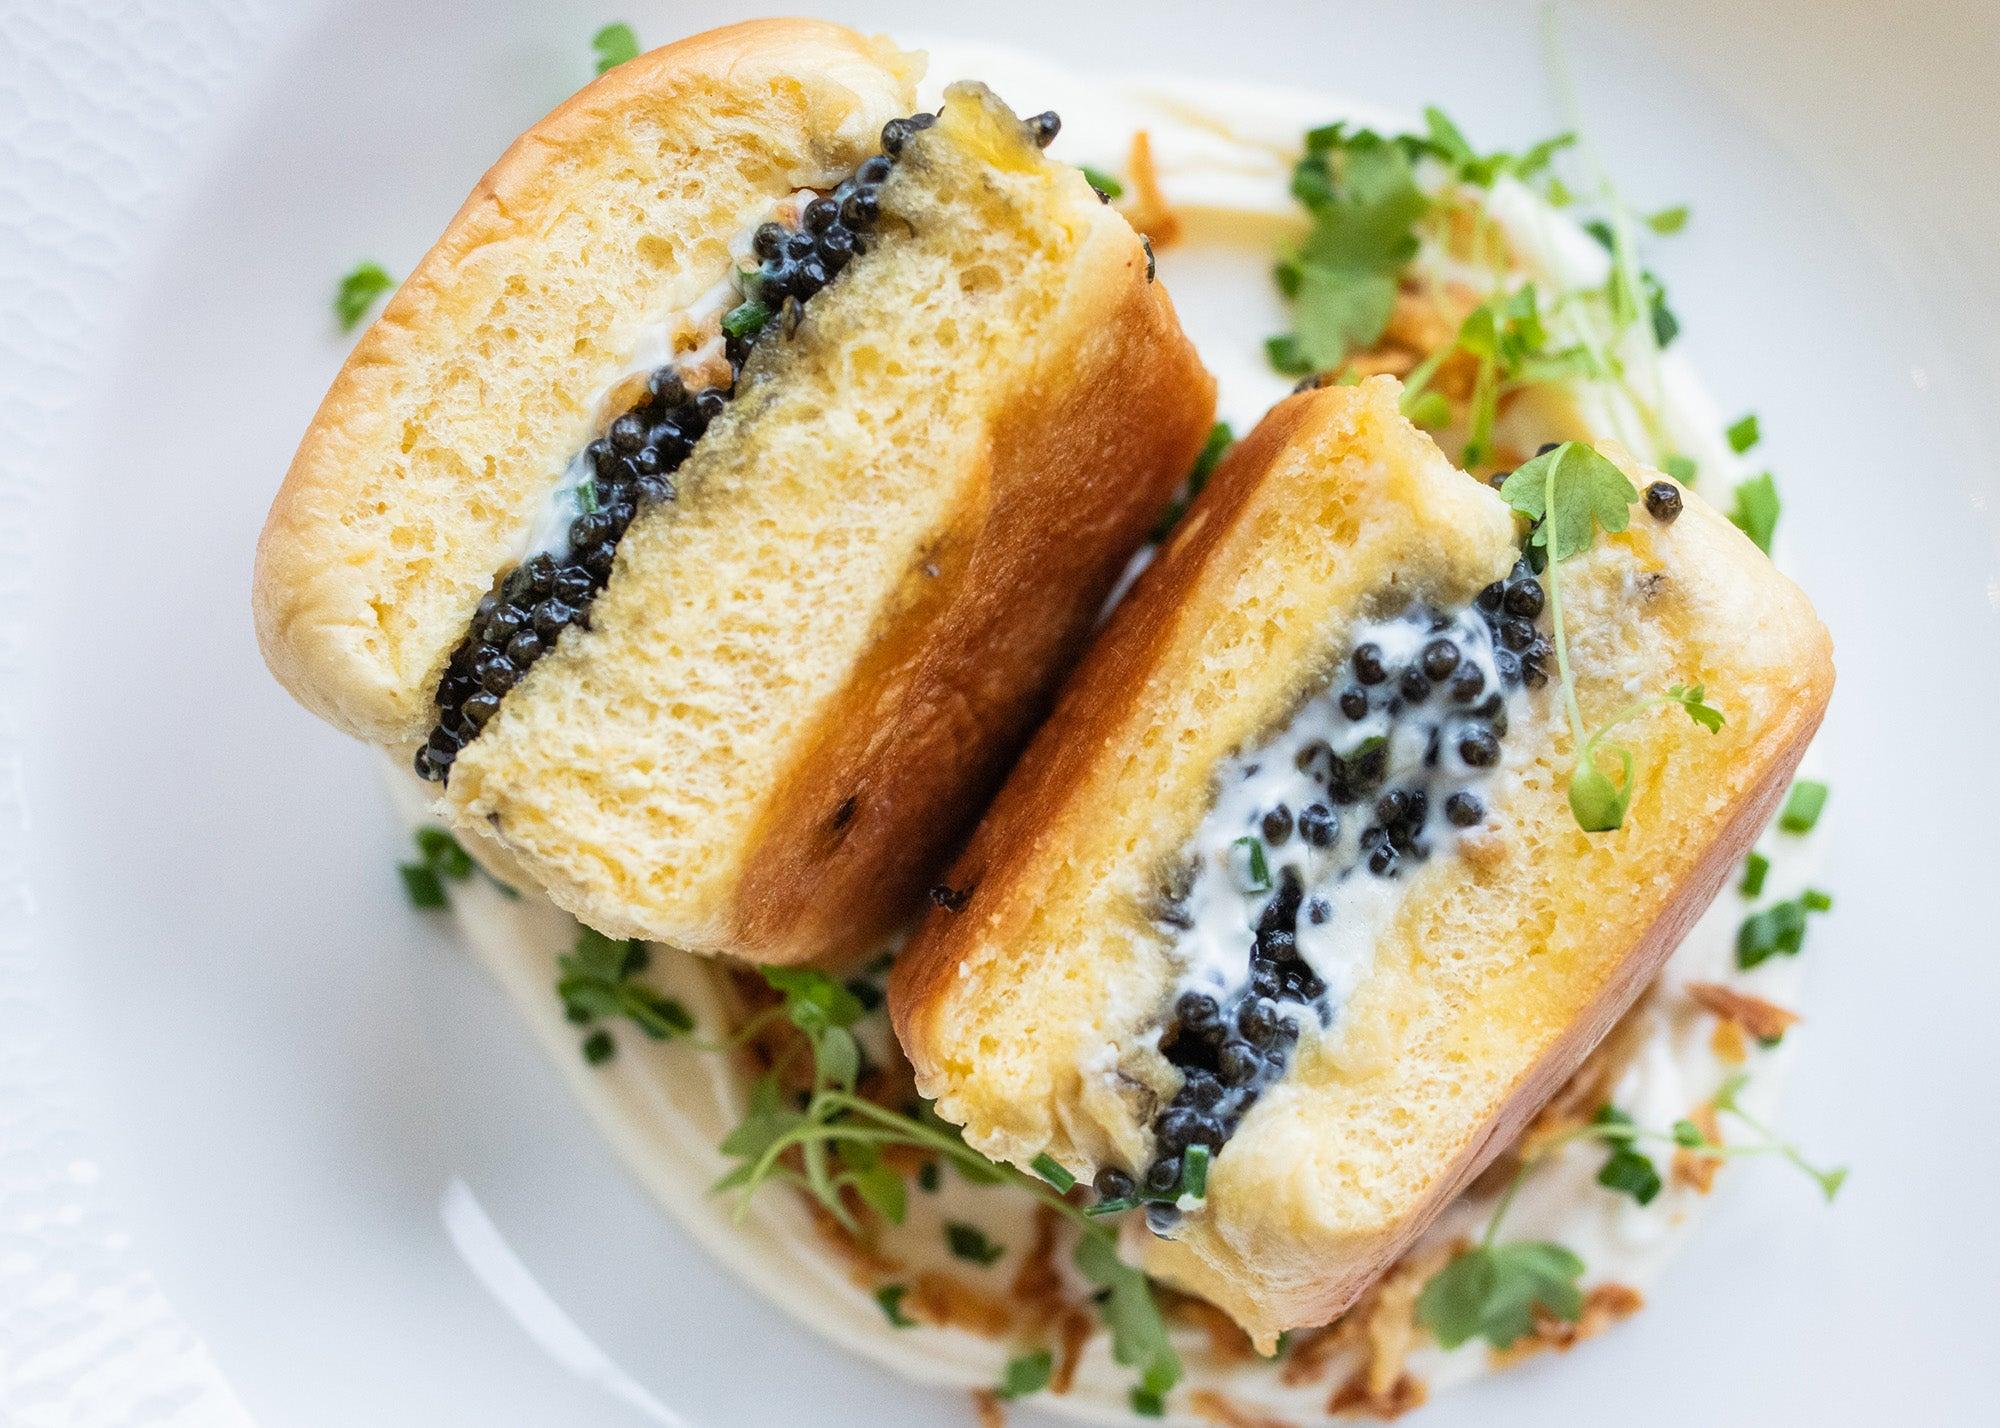 American caviar panini at Six West